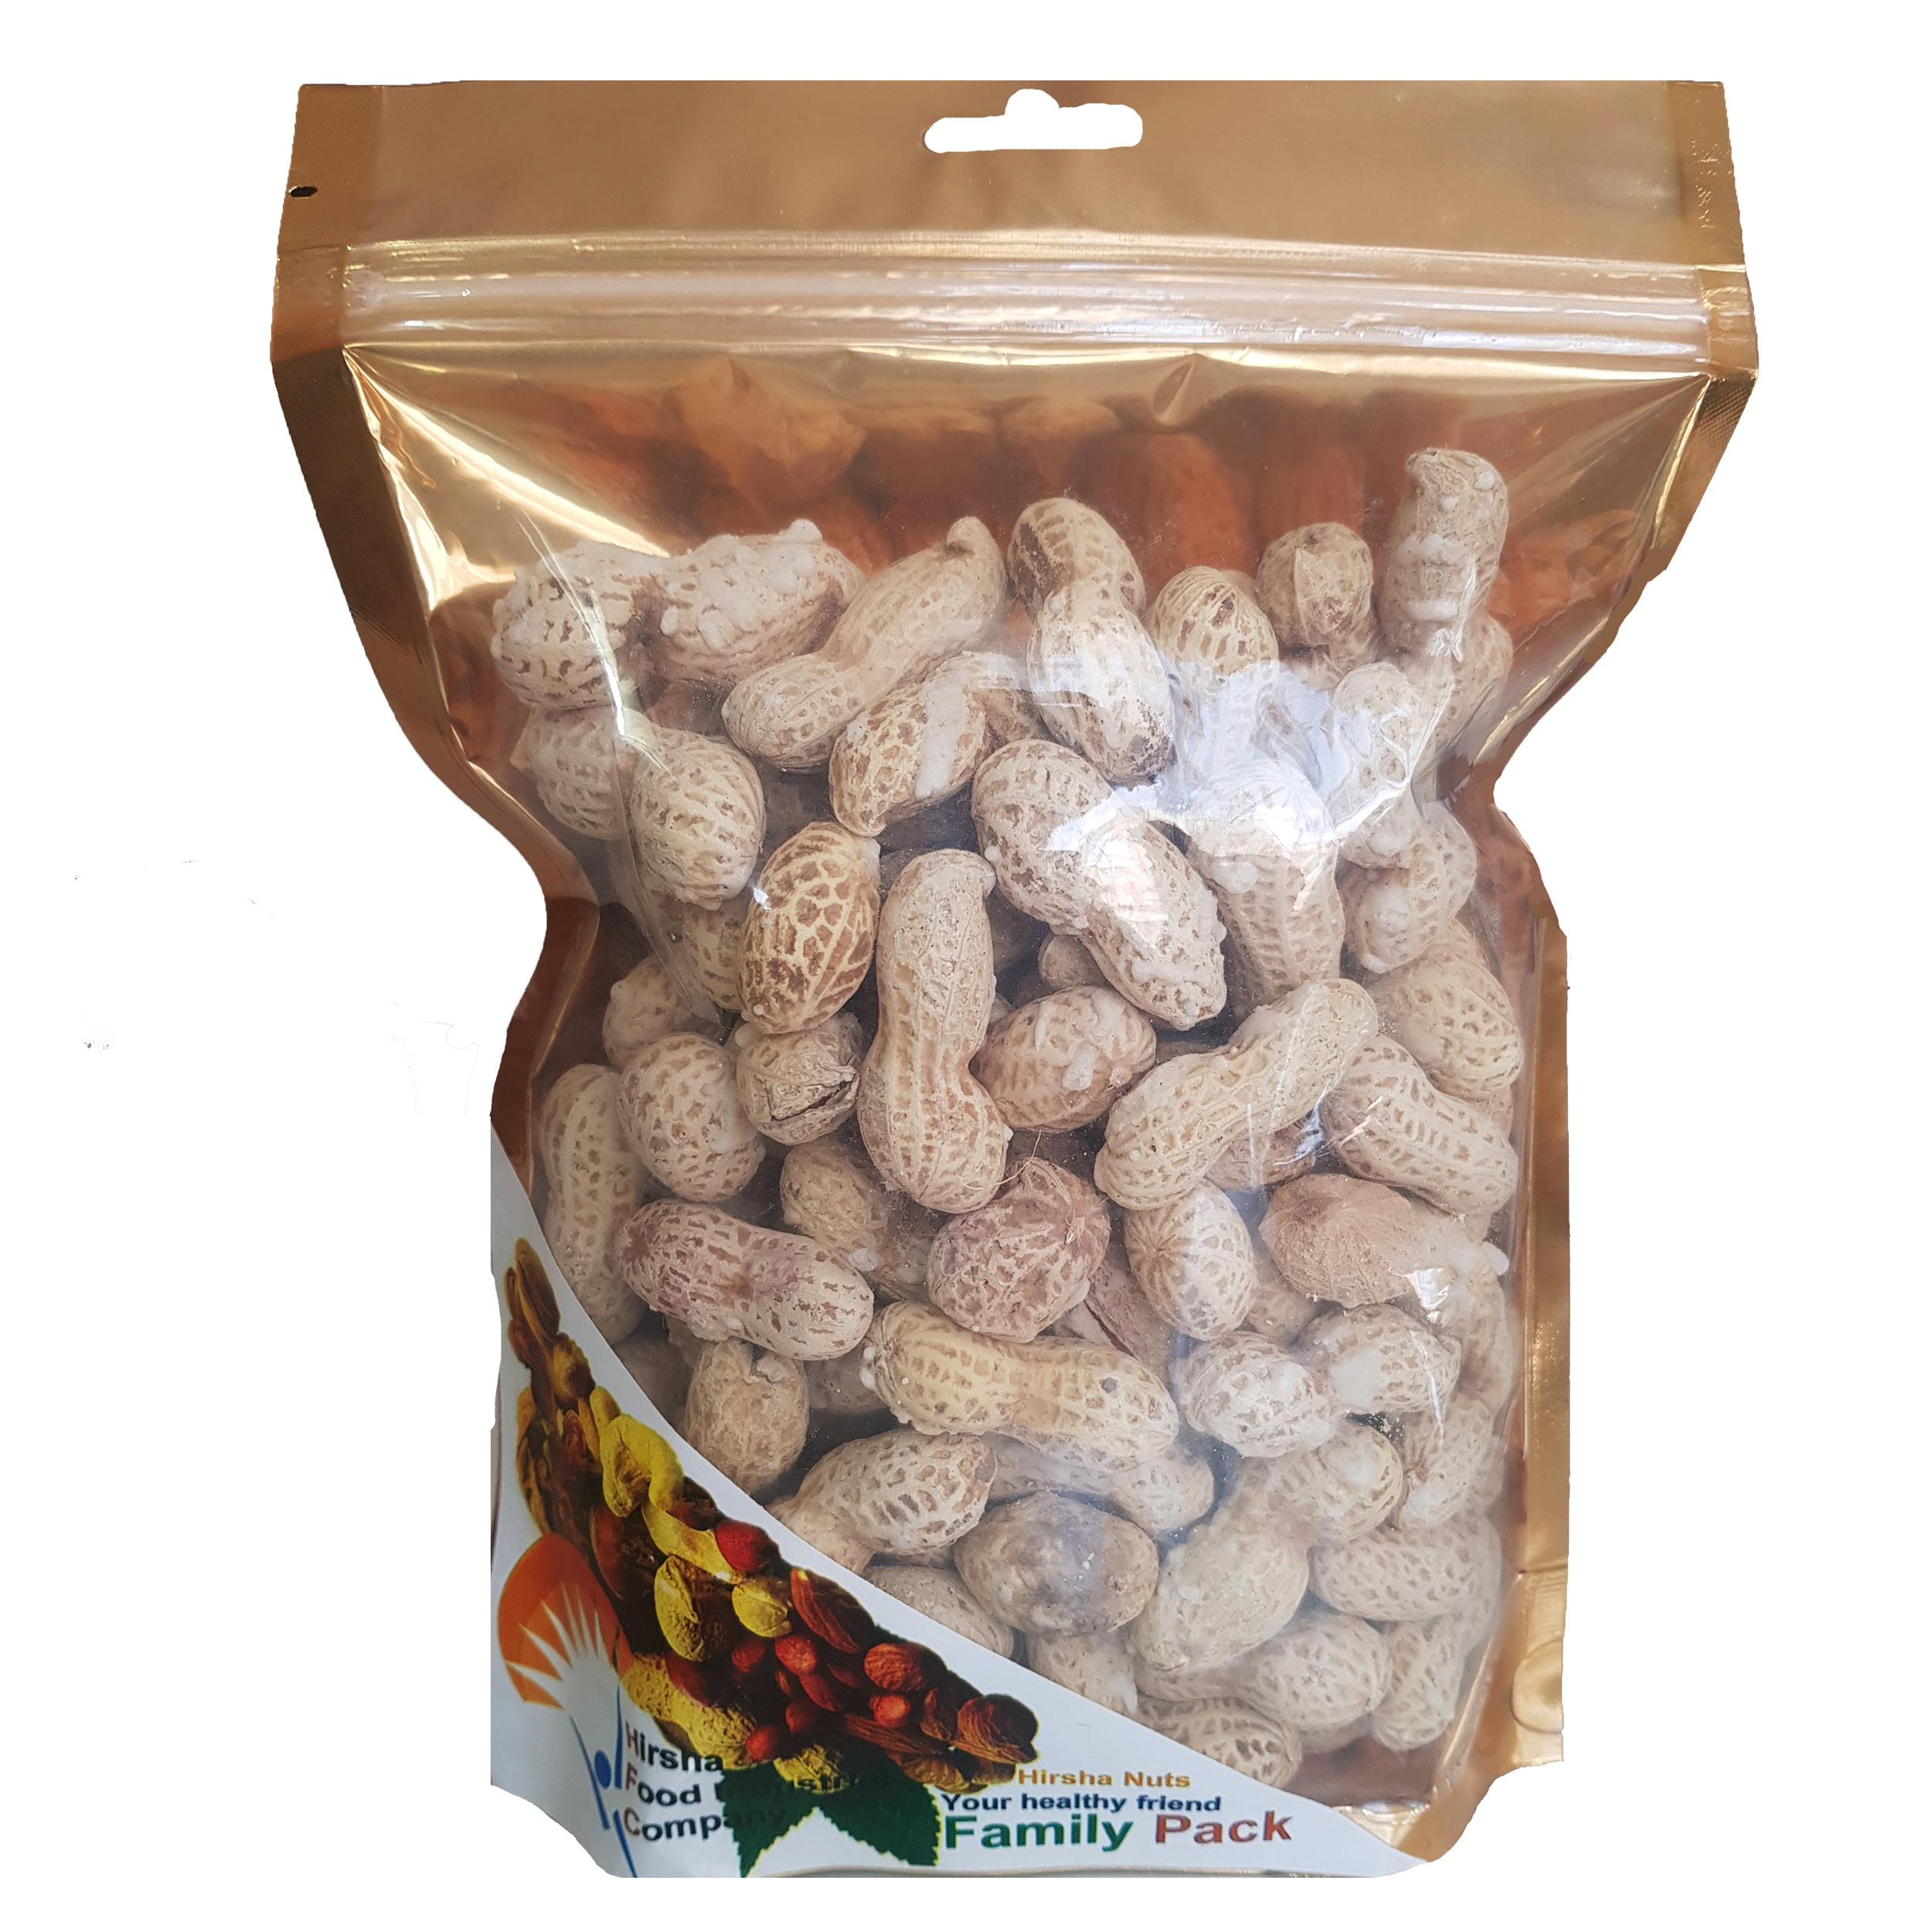 بادام زمینی با پوست هیرشا - 250 گرم